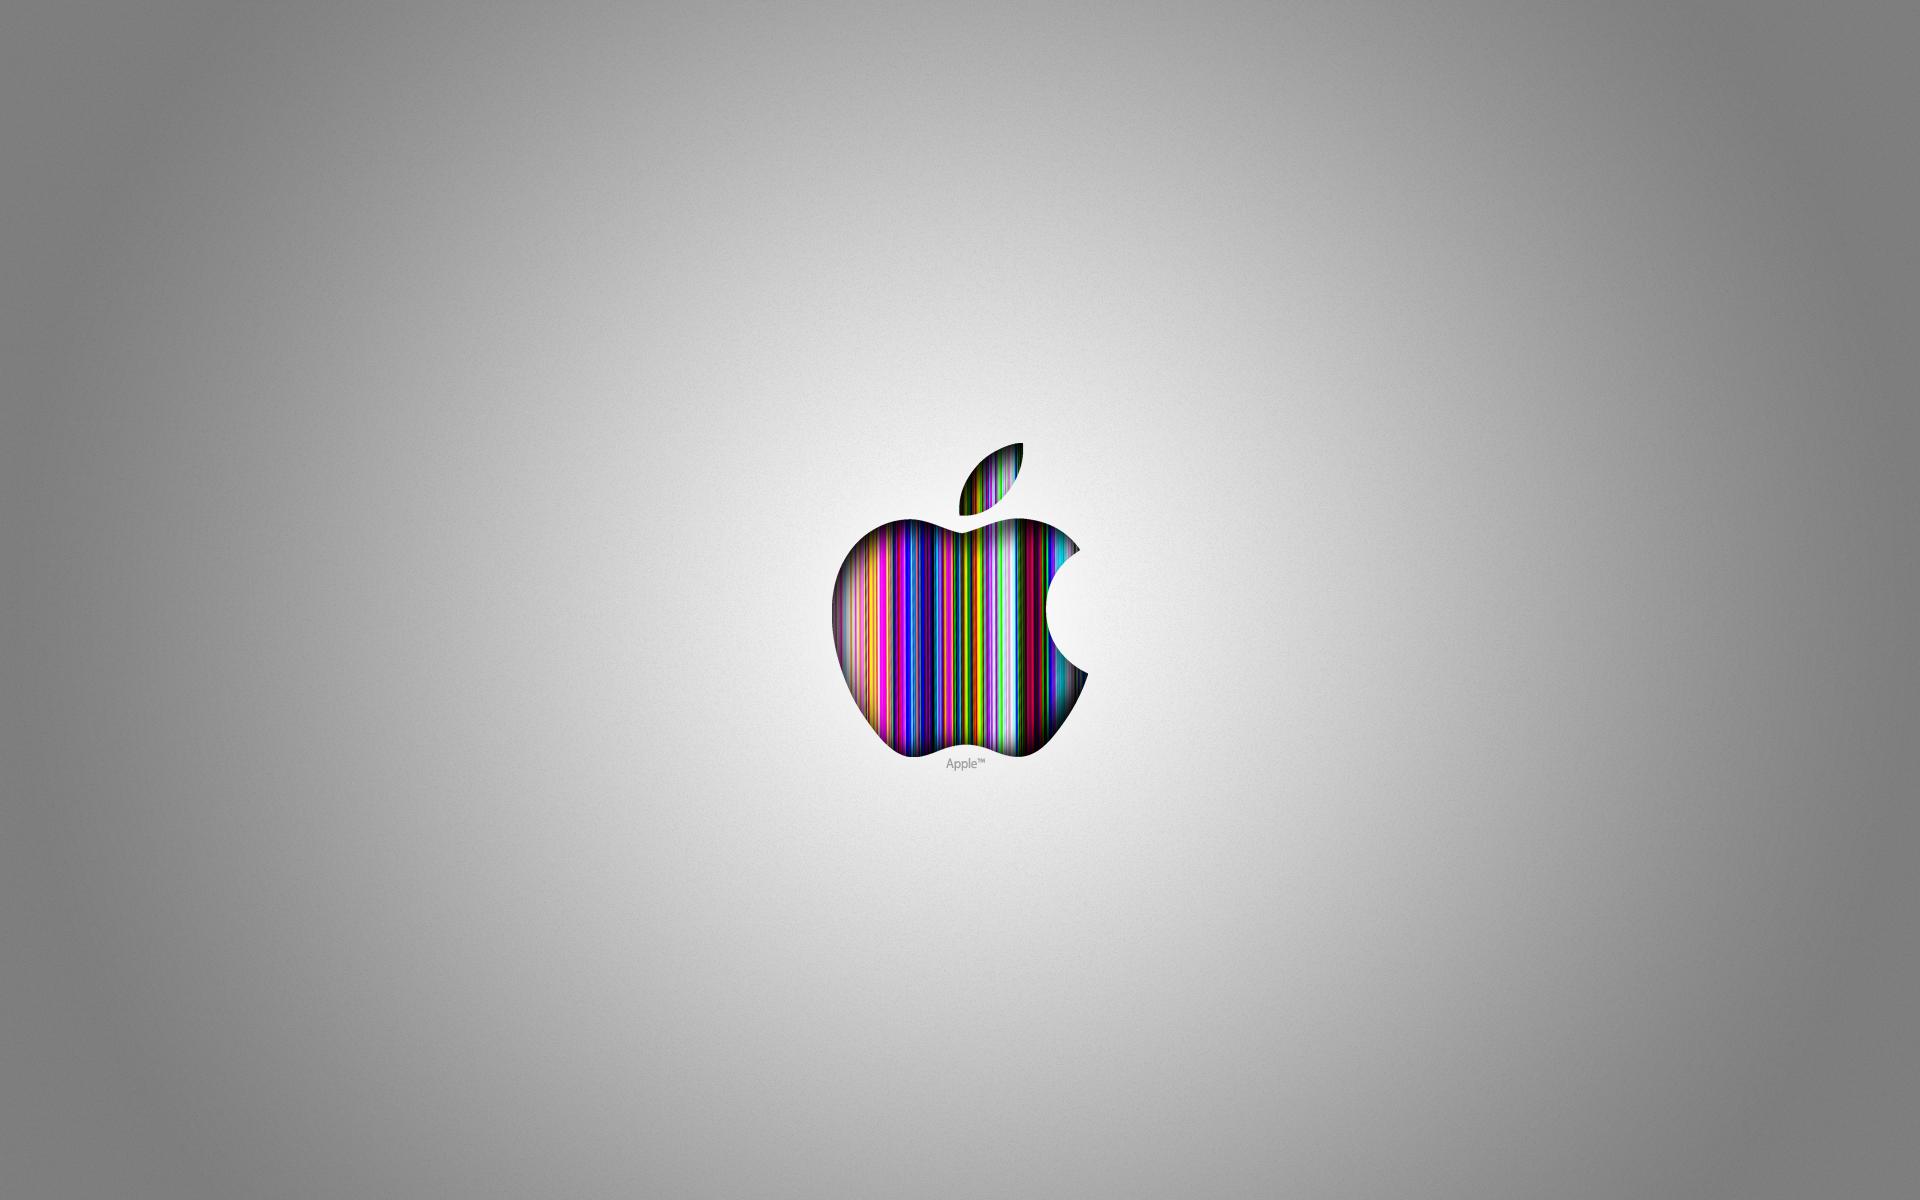 apple hd white wallpaper mac by cezarislt customization wallpaper mac 1920x1200